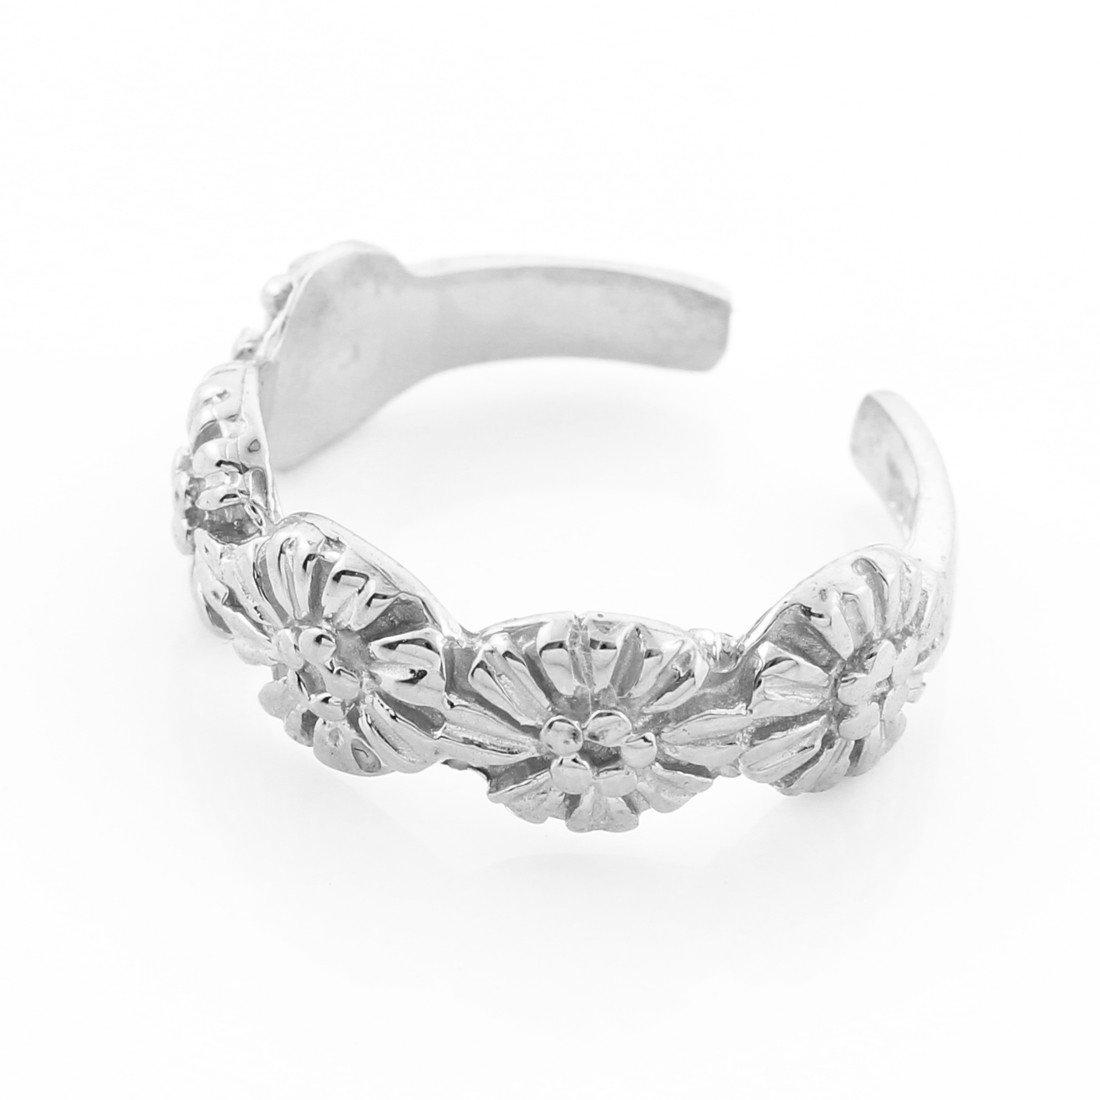 10k White Gold Floral Toe Ring